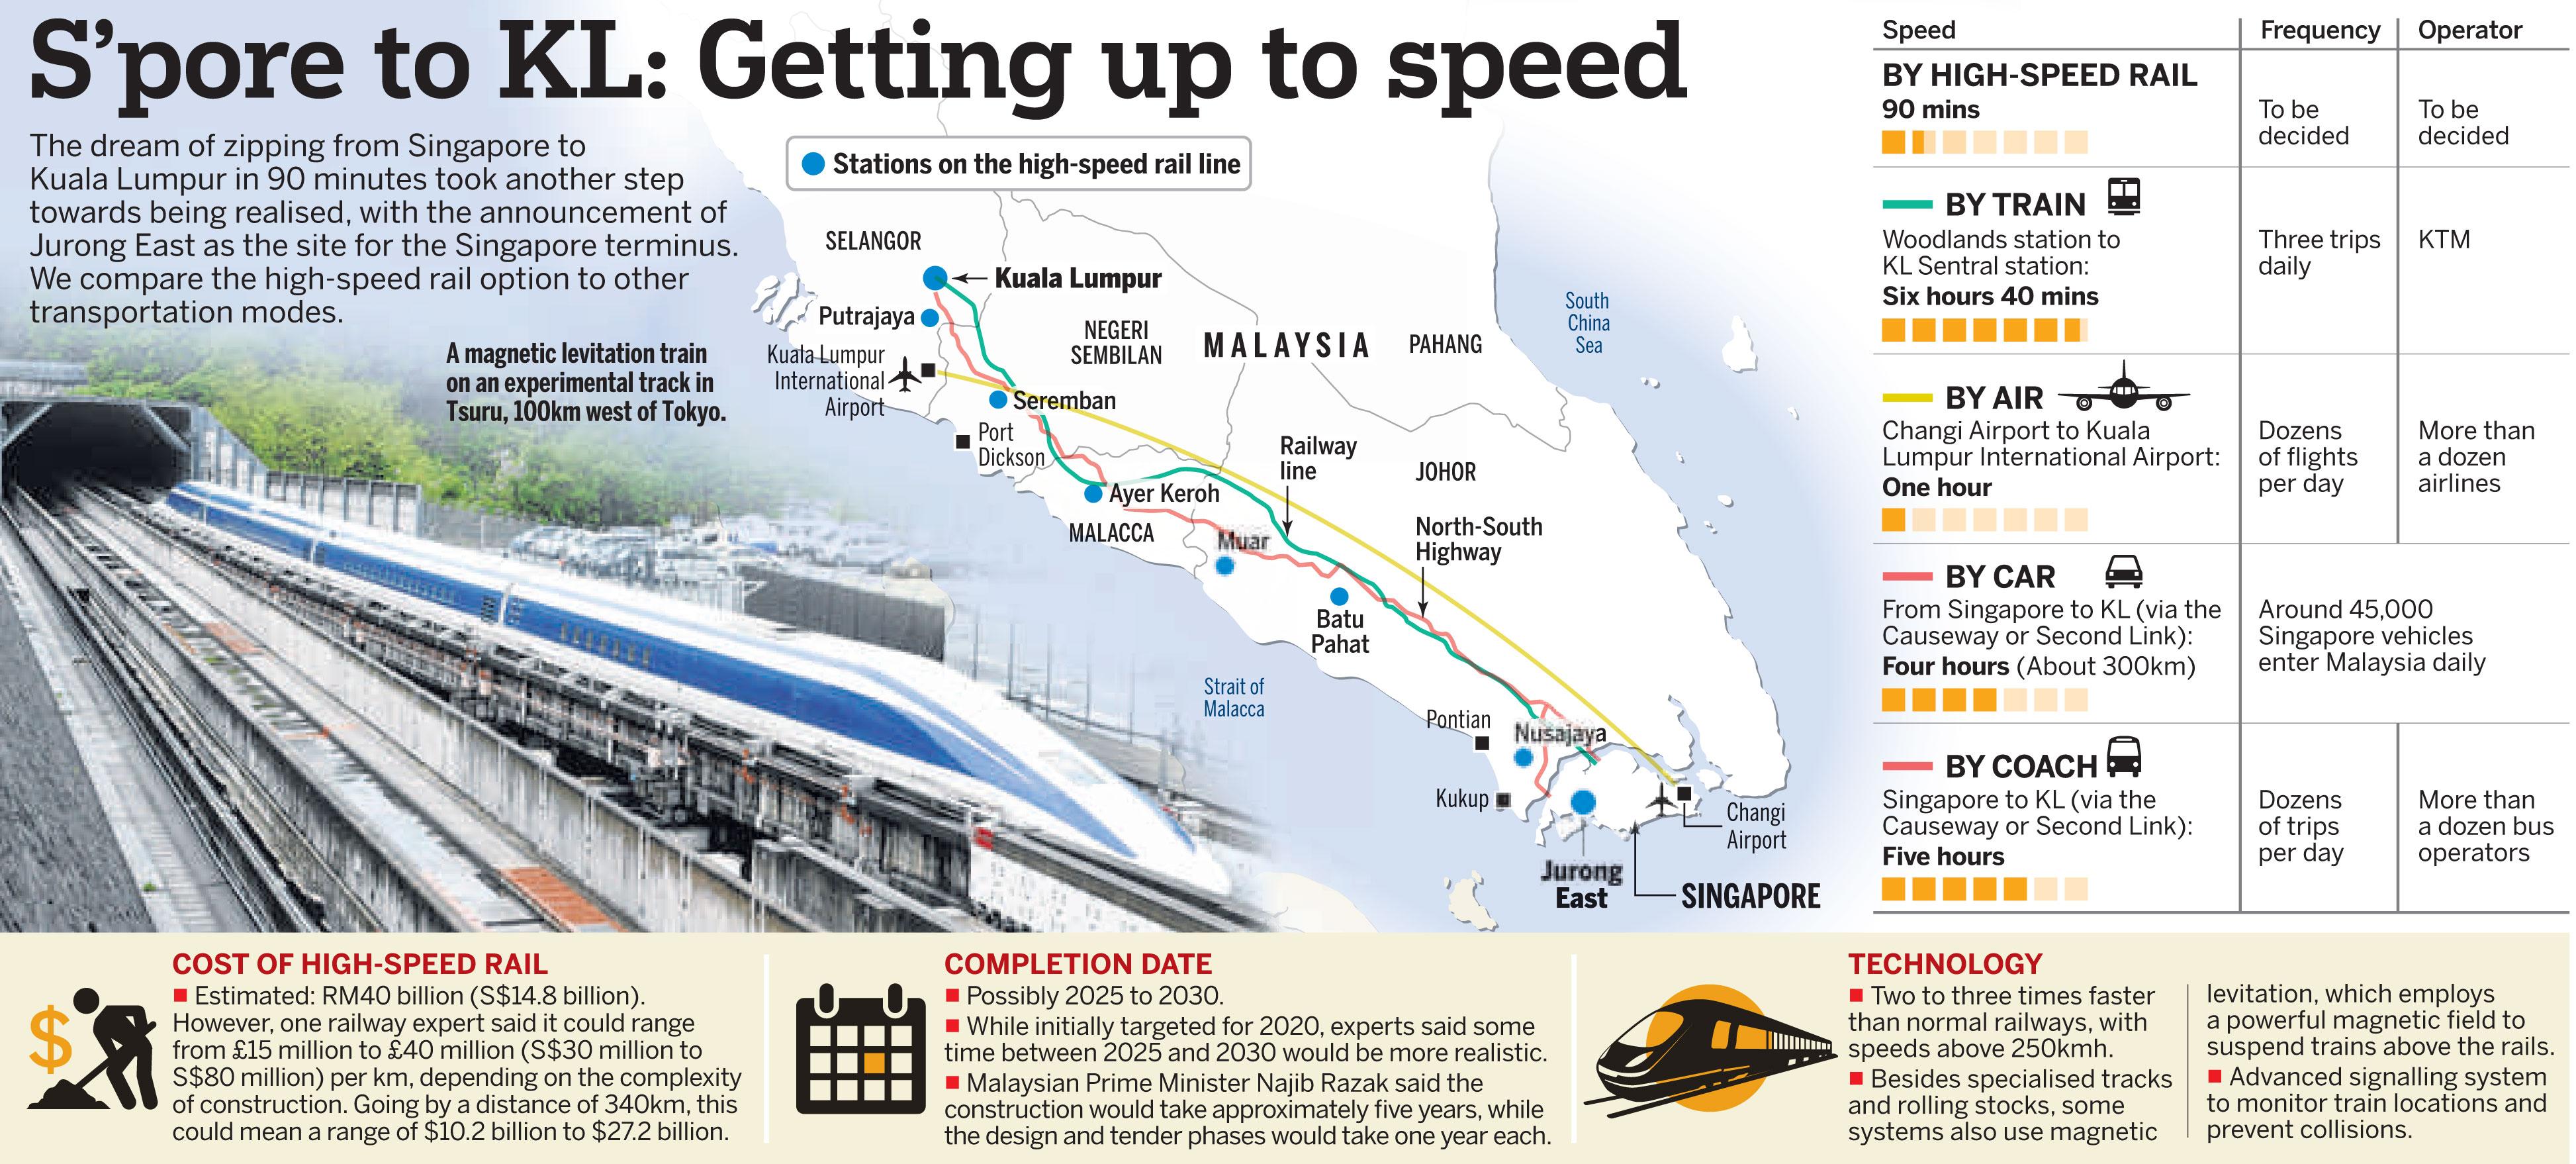 Singapore-KL HSR